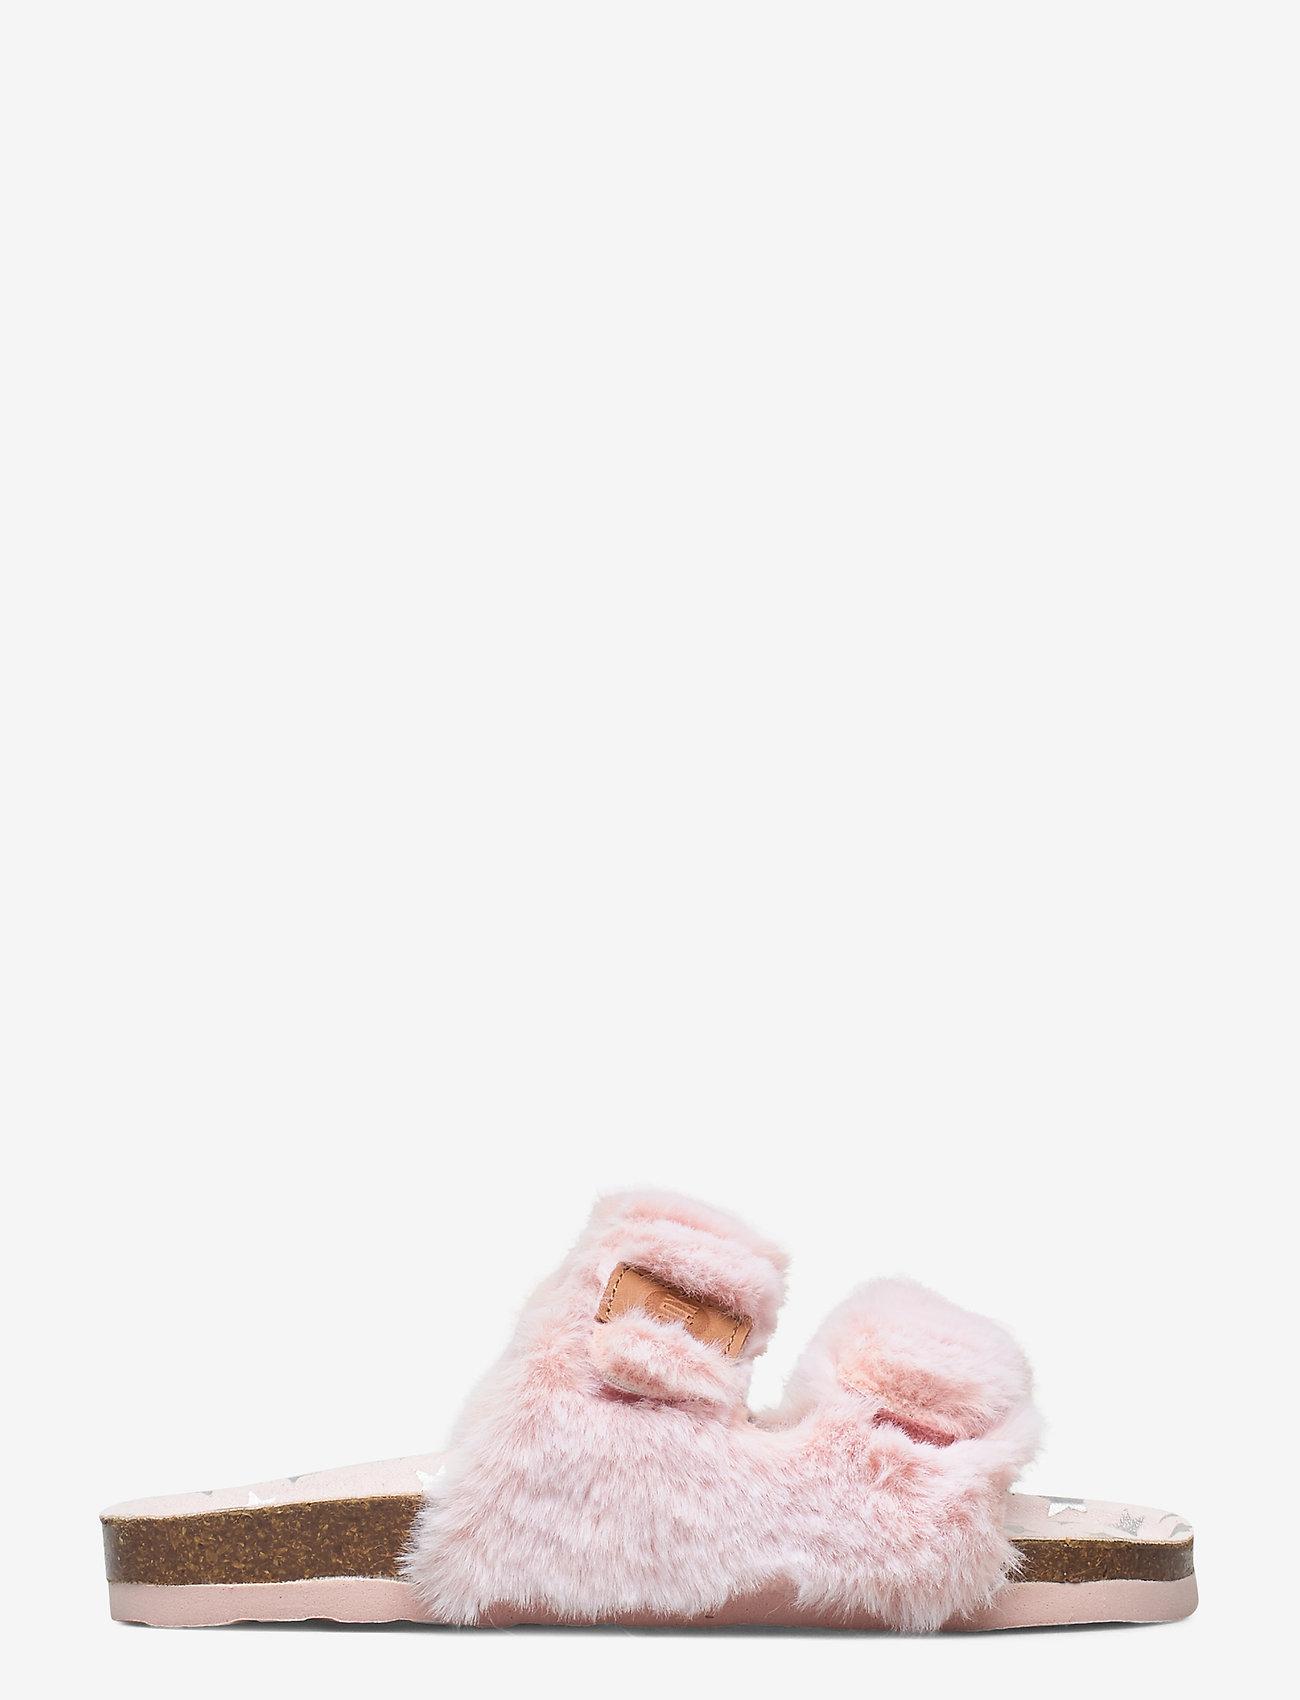 PAX - NORDAN PAX SANDAL - schuhe - pink - 1